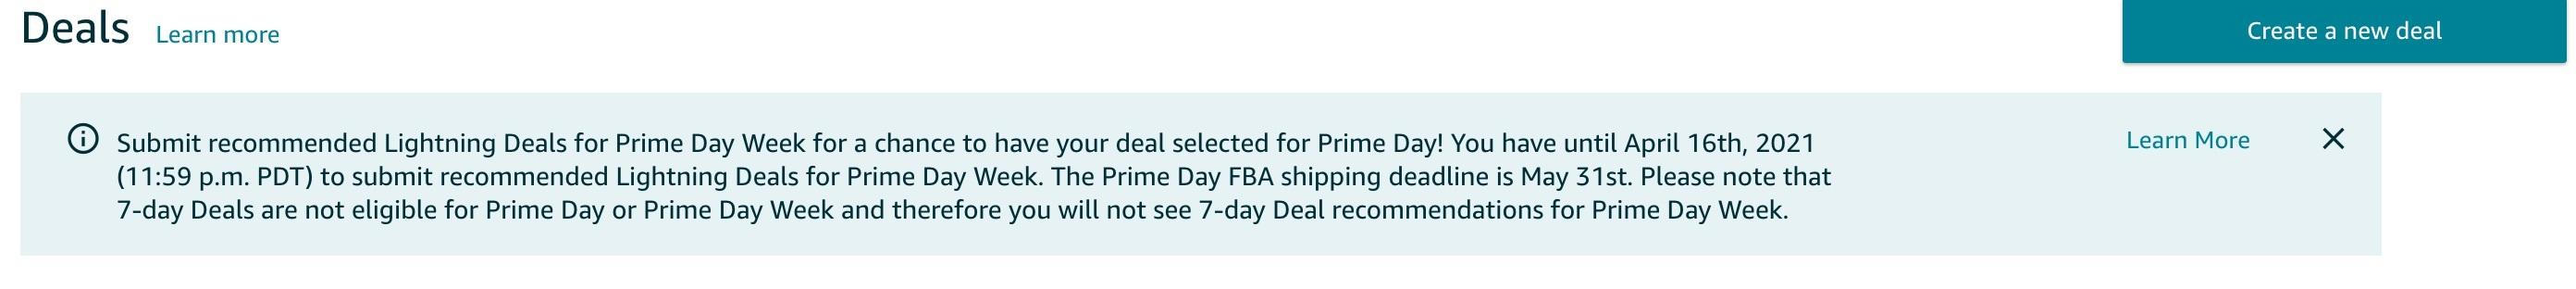 Amazon Prime Day 2021 News announcement